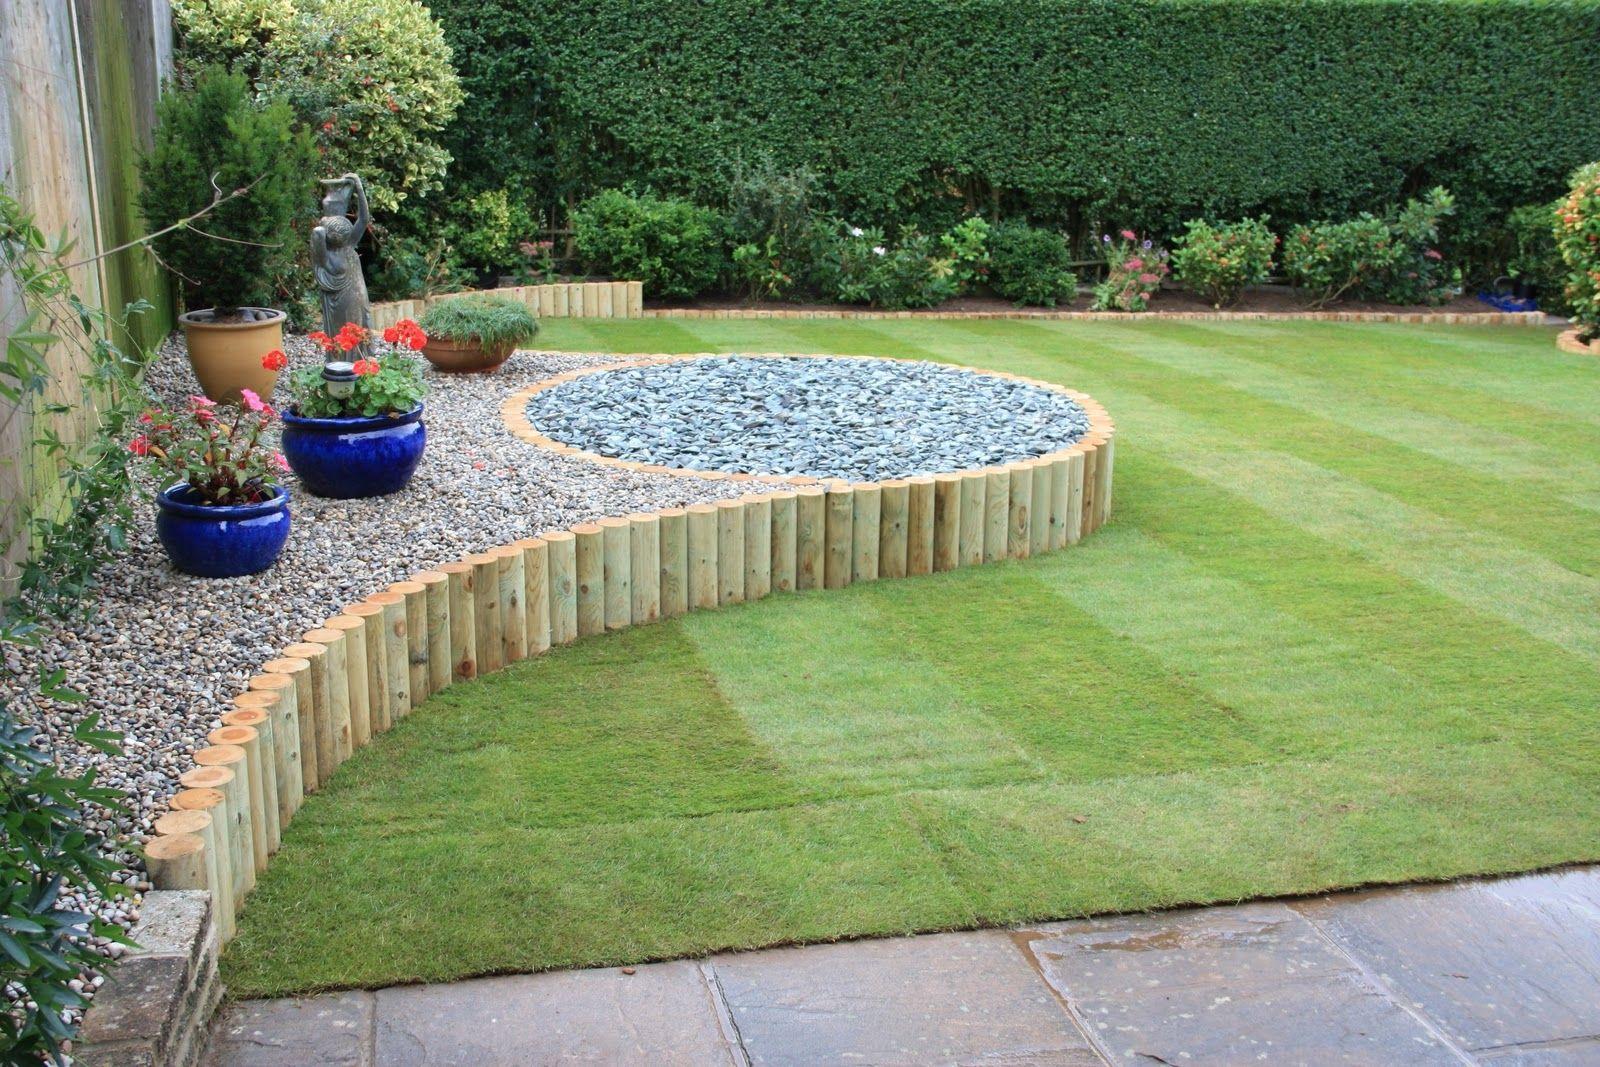 Wunderbar Einfache Garten Ideen Und Designs #Garten #Gartenplanung # GartenIdeen